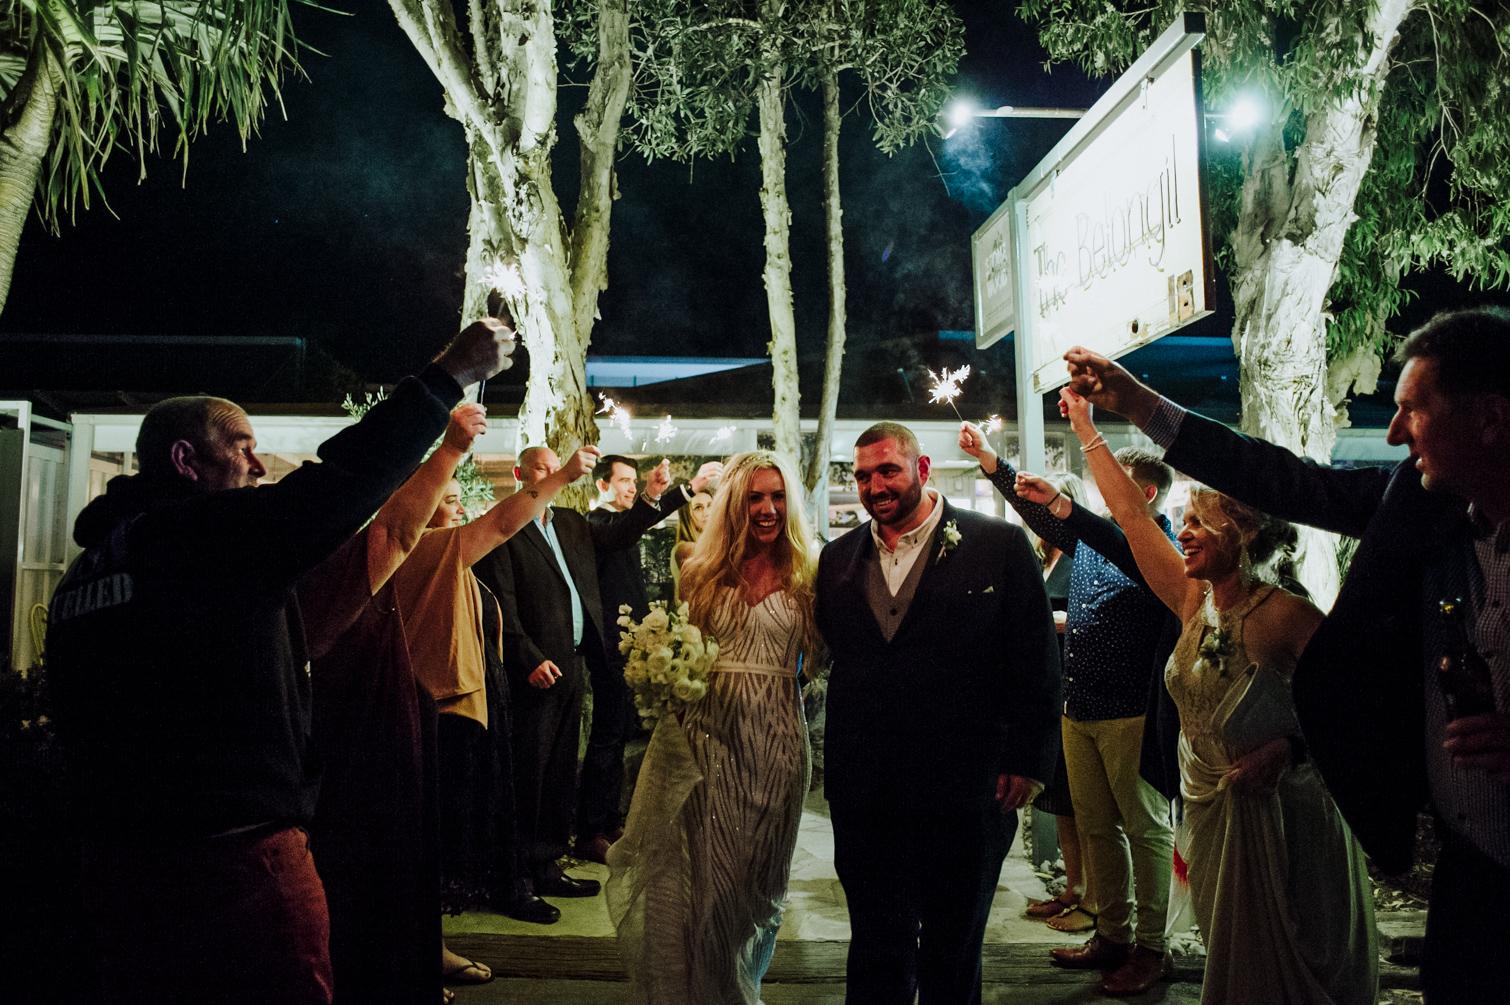 The_Belongil_Byron_Bay_Weddings_New_Black_Studios-265.jpg